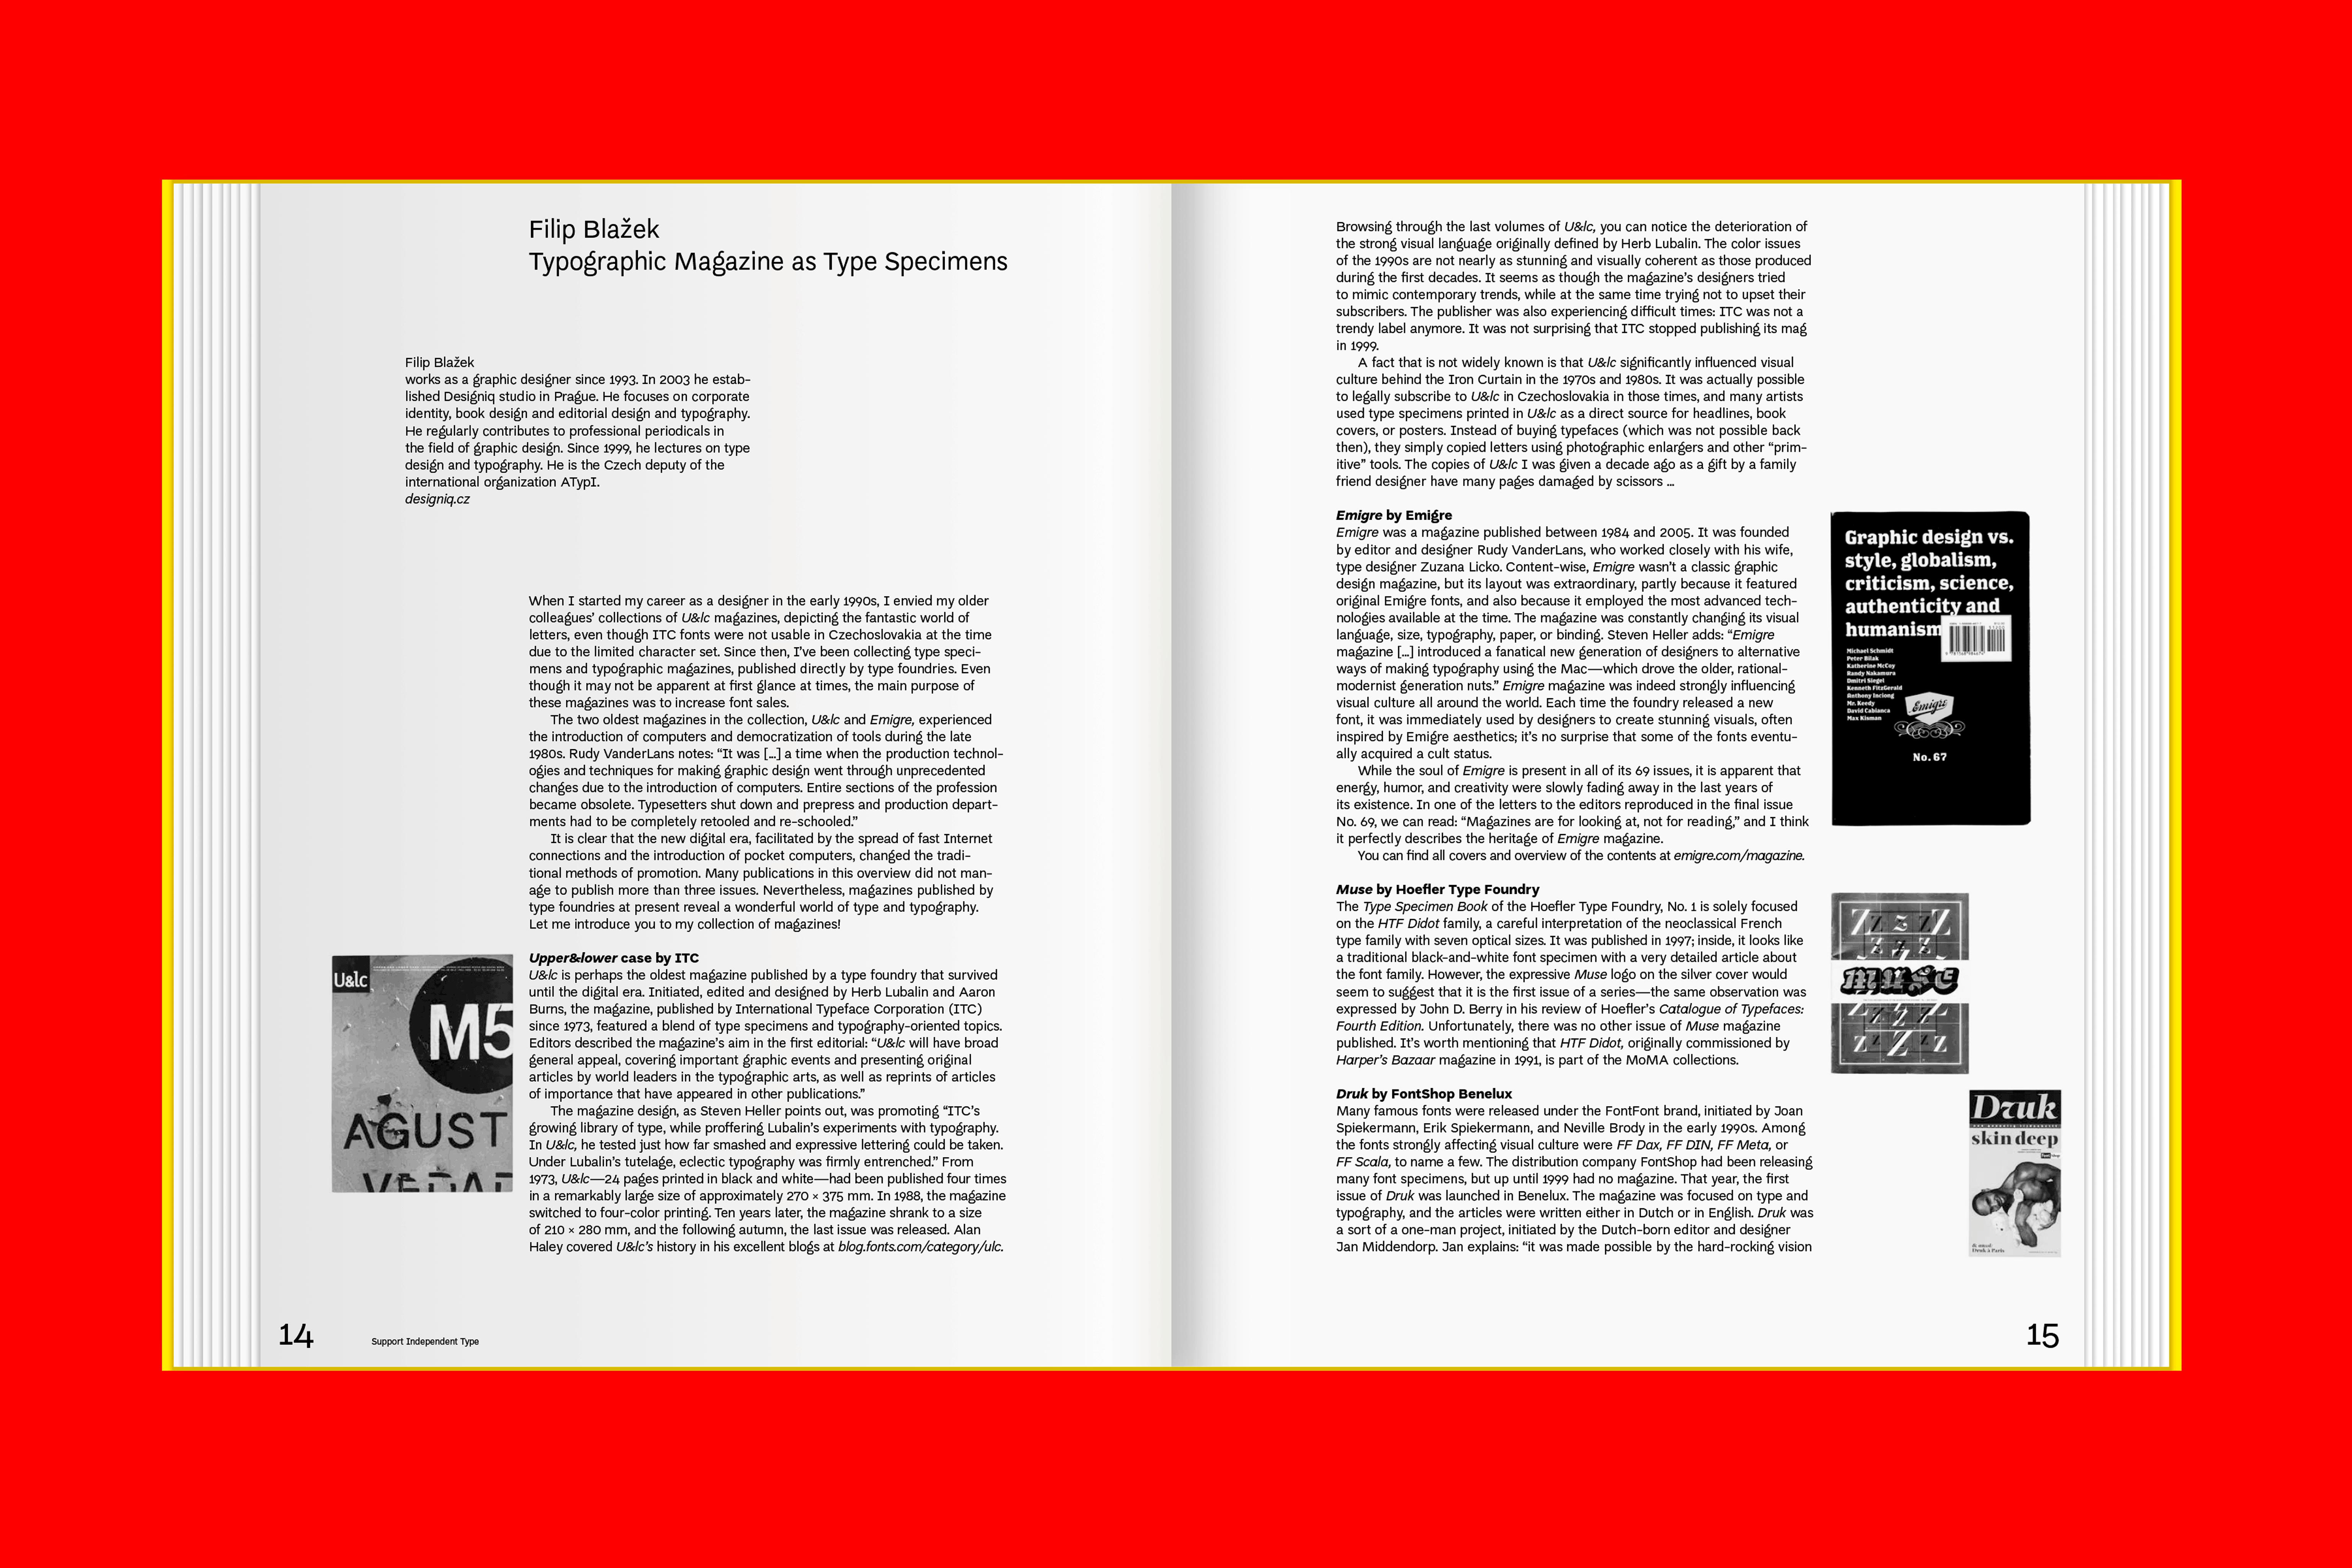 Slanted-Publiaktionen-Slanted-Publishers-Support-Independent-Type_07